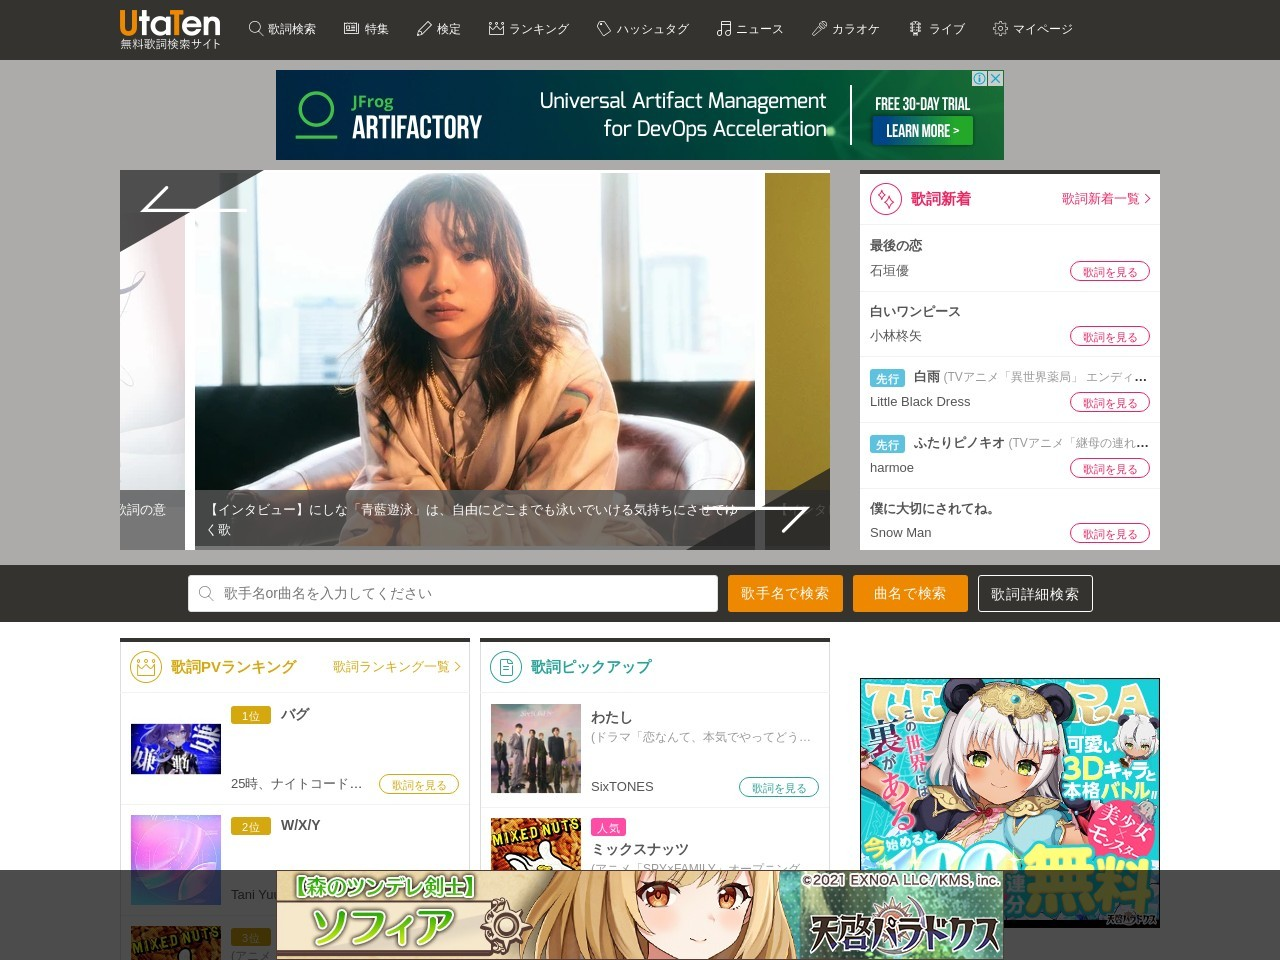 Face My Fears (Japanese Version) 歌詞「宇多田ヒカル & Skrillex」ふりがな付|歌詞検索サイト【UtaTen】